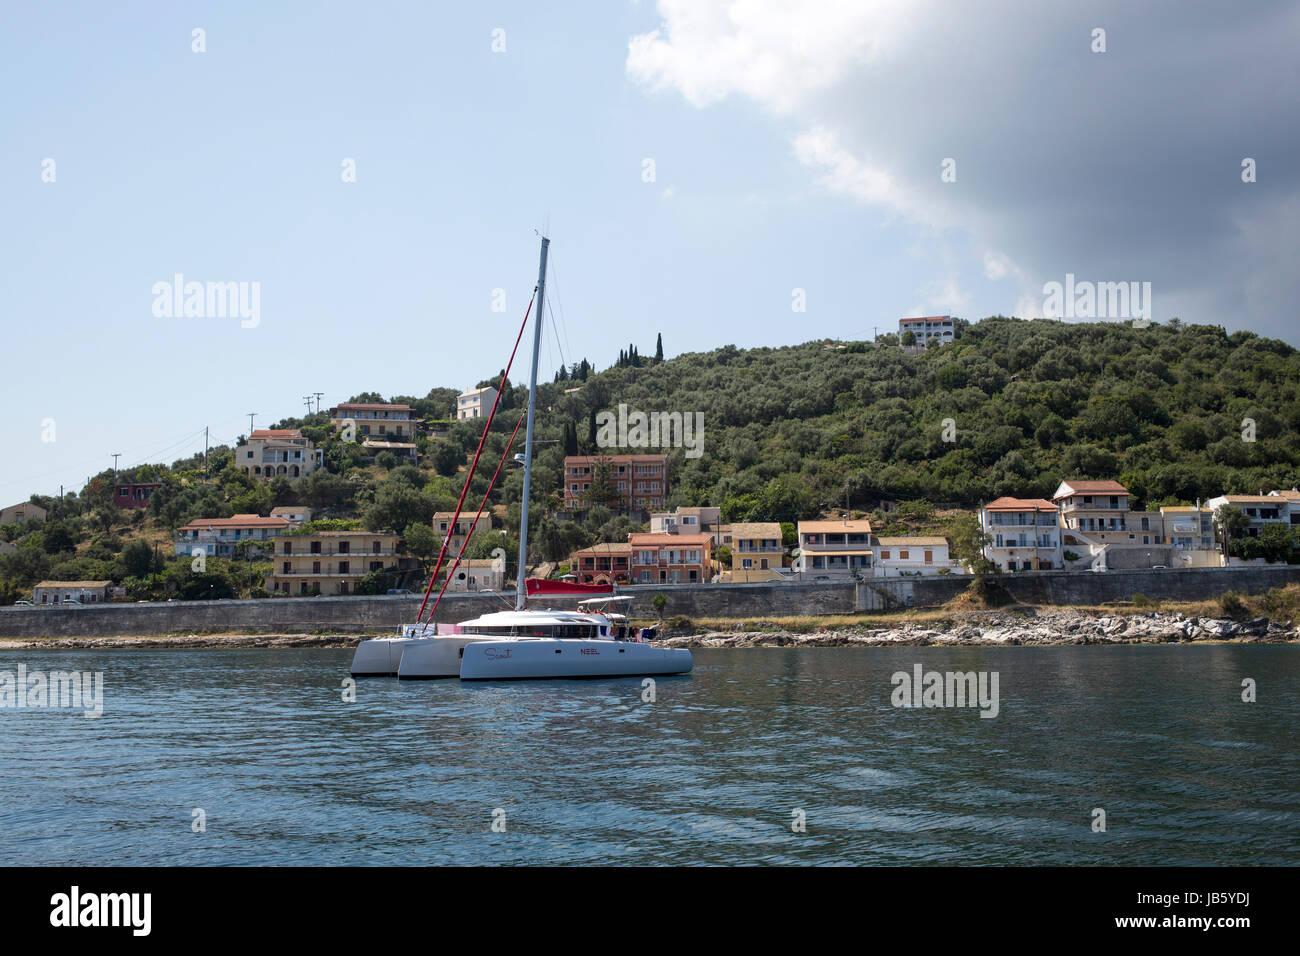 Neel 45 trimaran at anchor in Kassiopi, Corfu - Stock Image